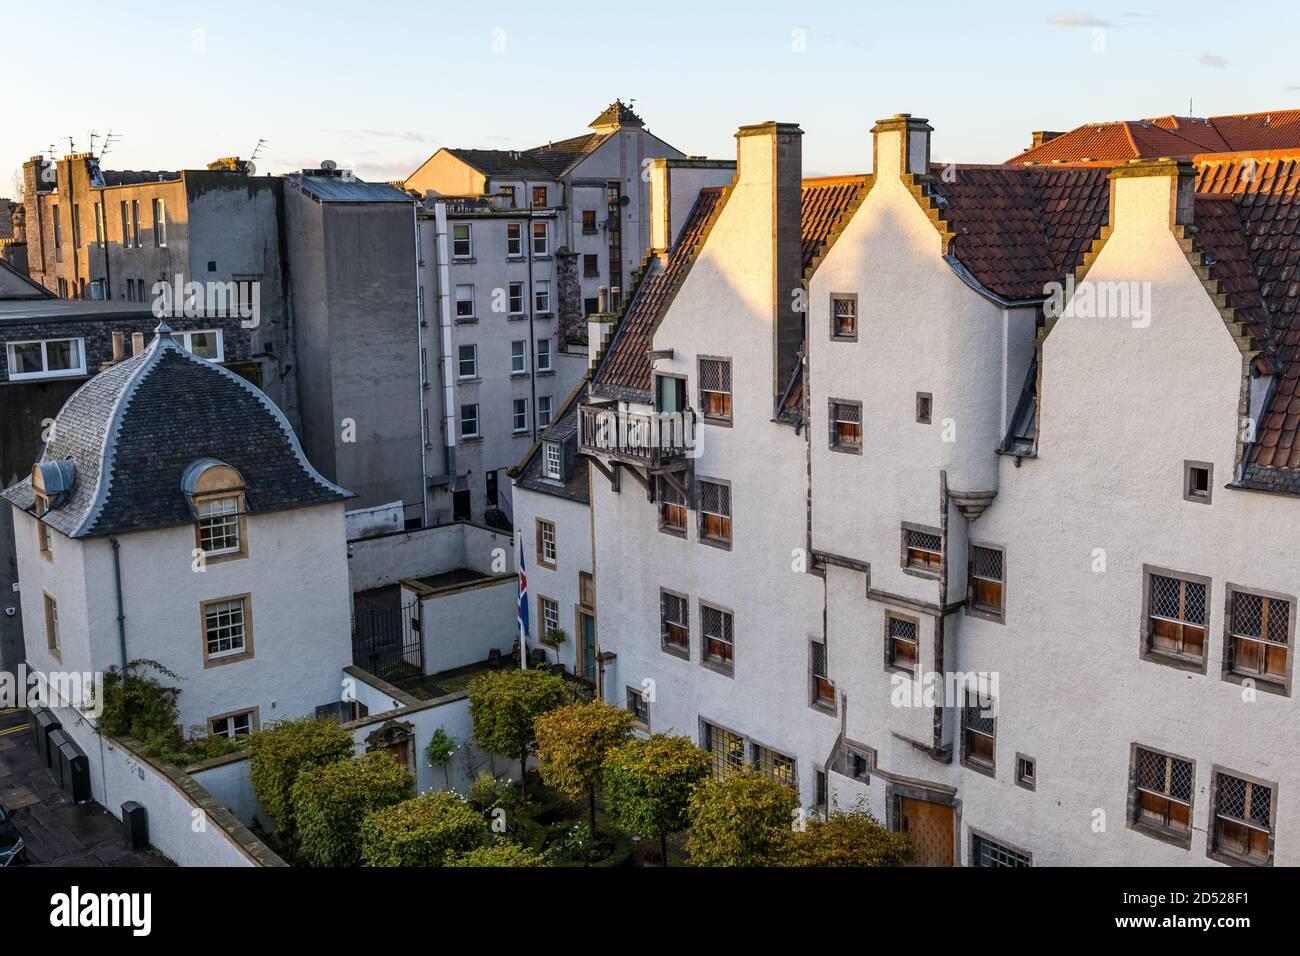 leith-edinburgh-scotland-united-kingdom-